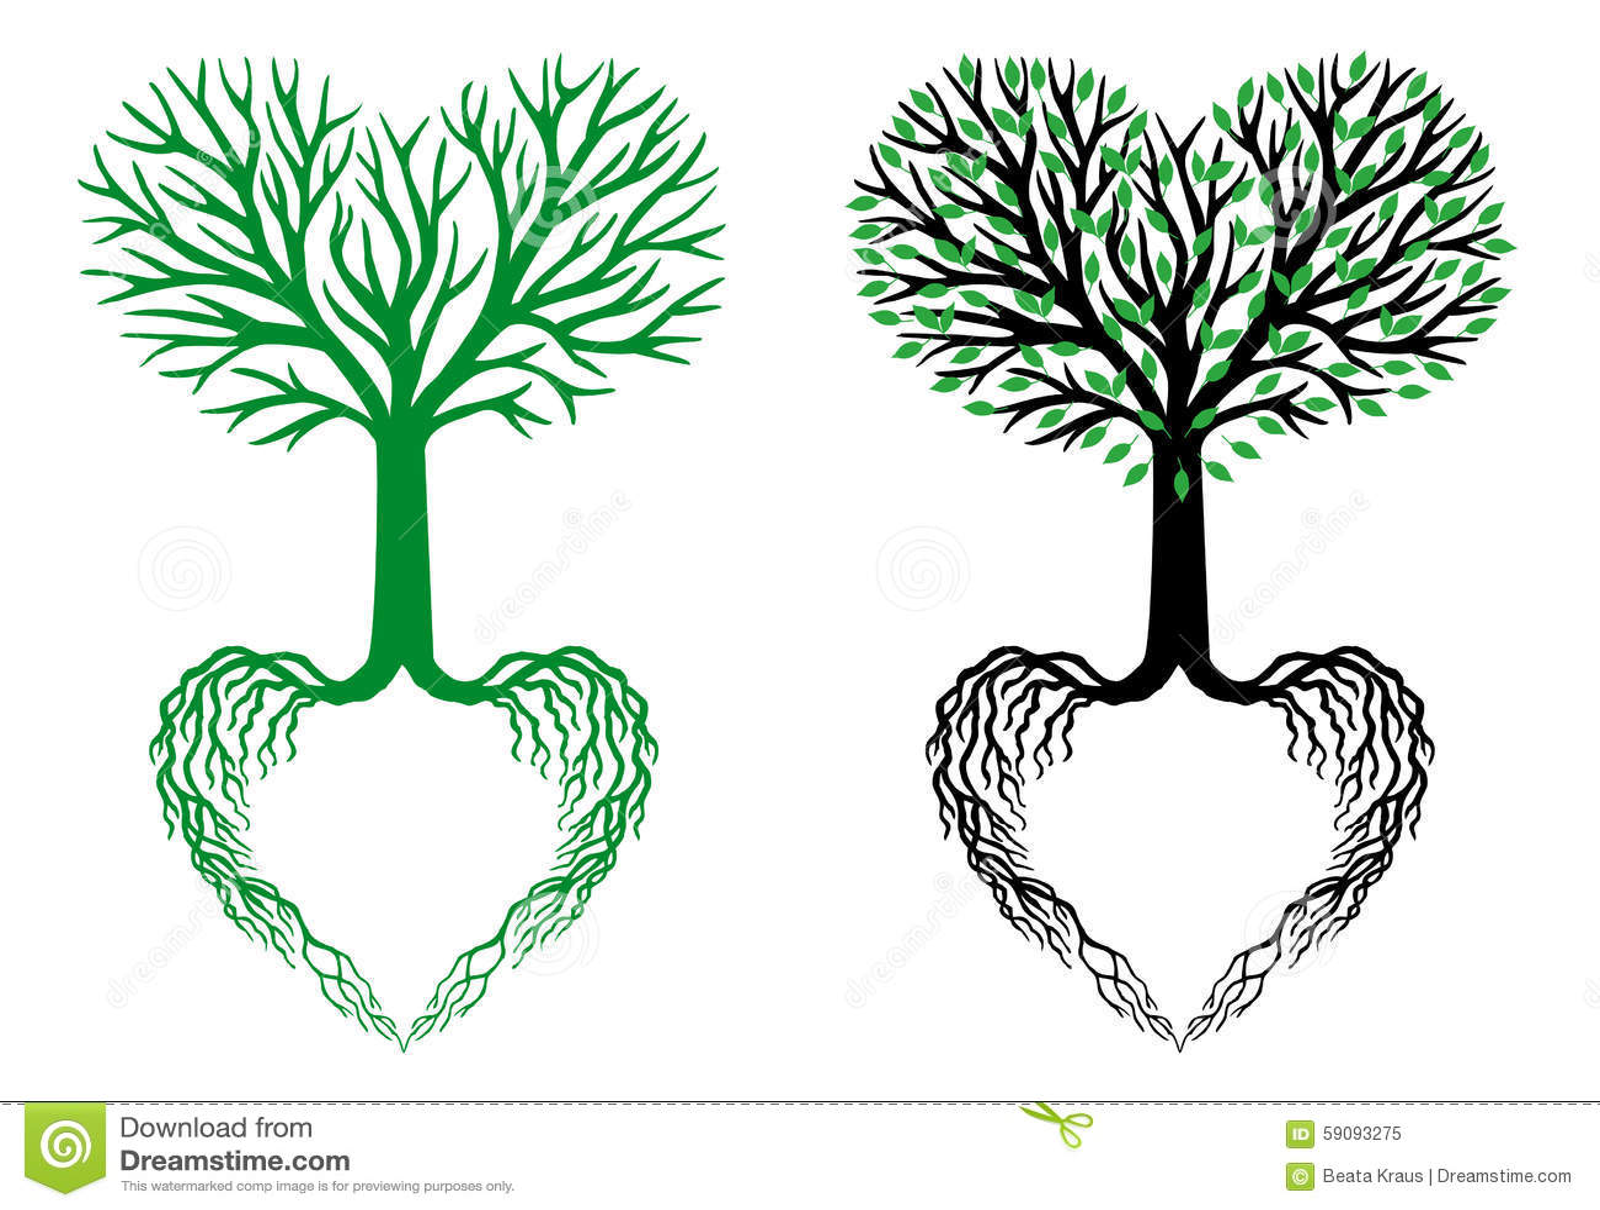 Дерево жизни, дерево сердца, вектор